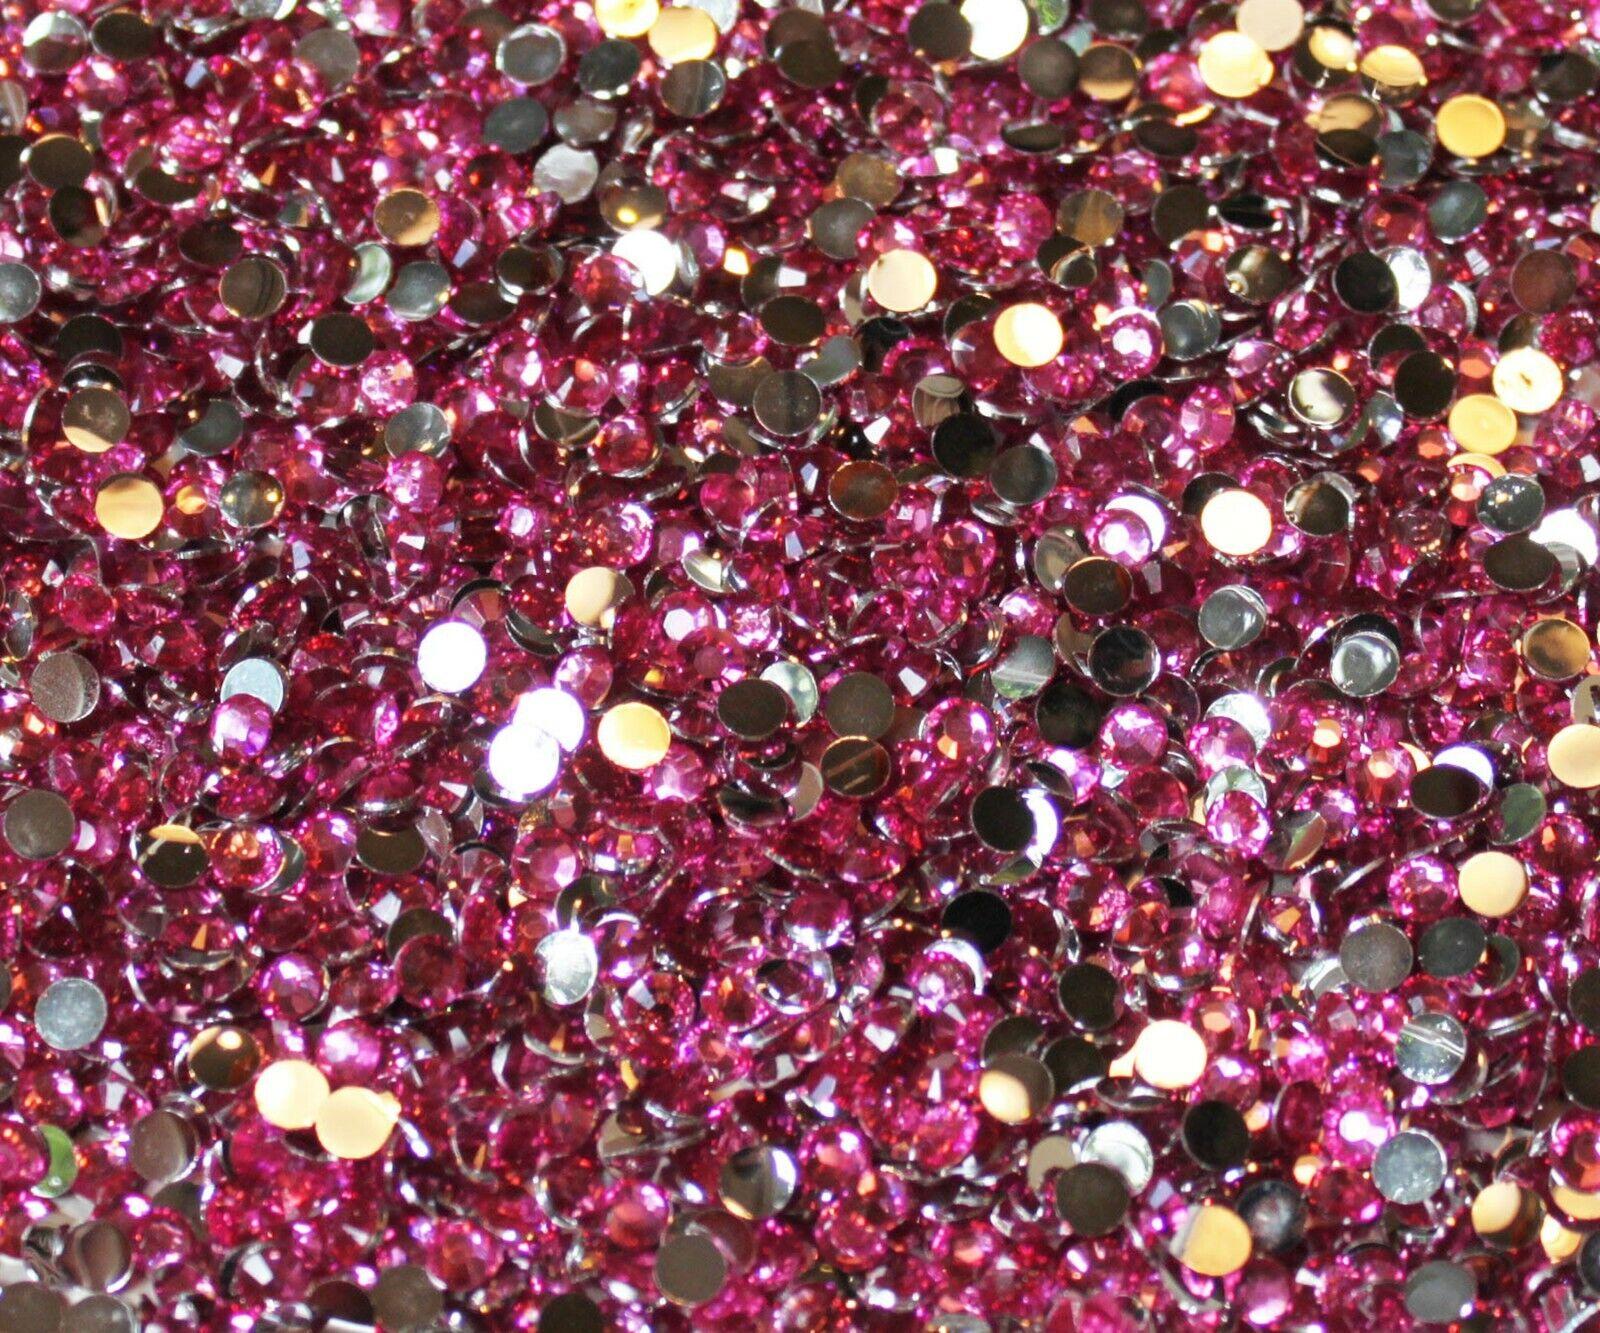 1000 Crystal Flat Back Resin Rhinestones Gems 60 colors, 2mm, 3mm, 4mm, 5mm, 6.5 LIGHT ROSE